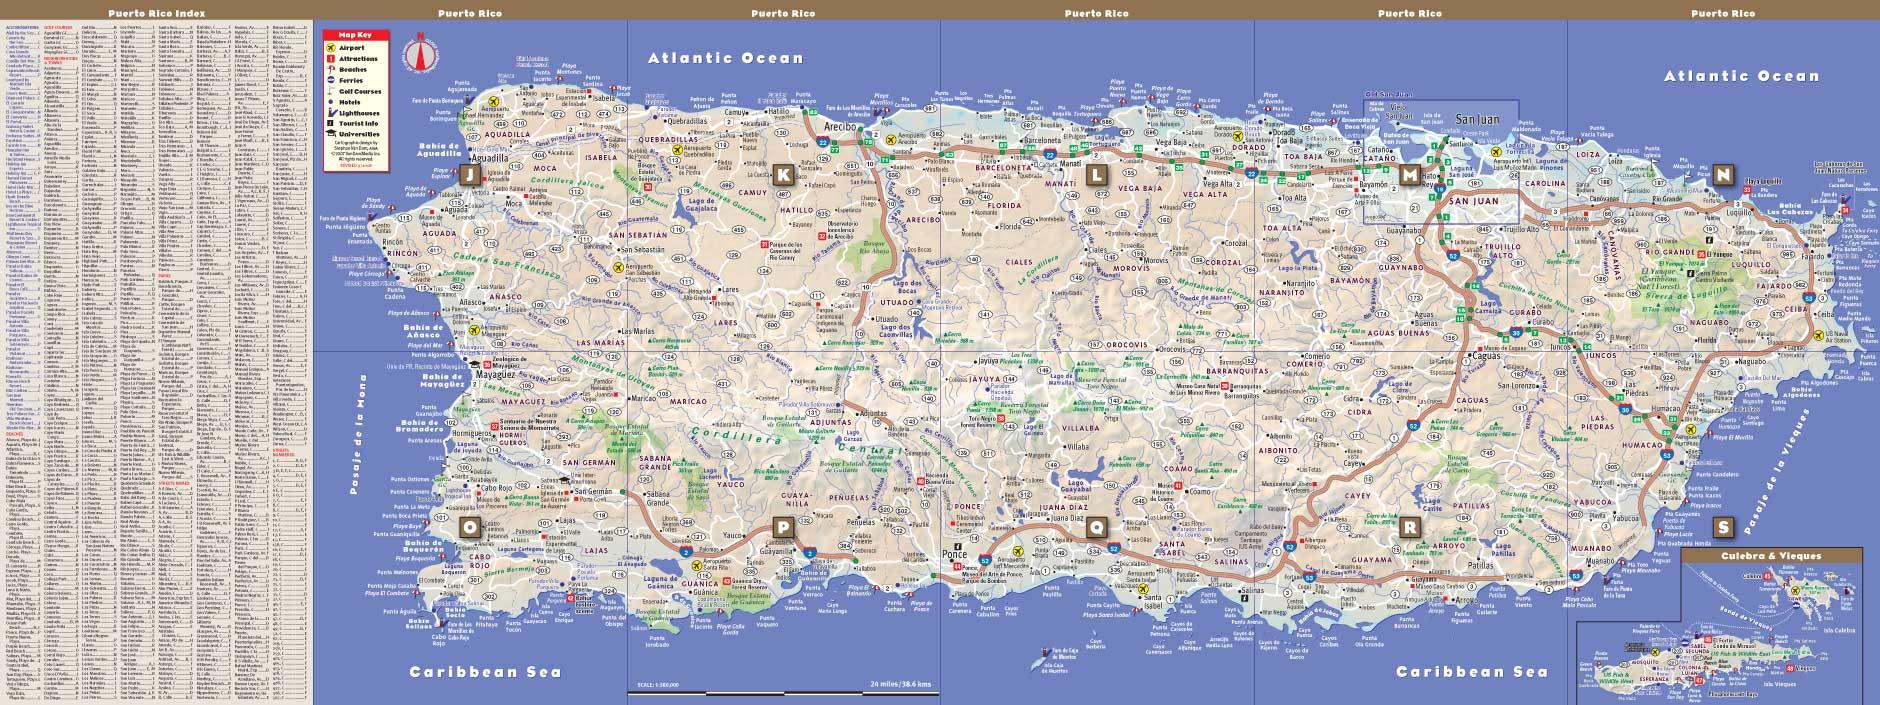 road map of puerto rico Puerto Rico Road Map Mapquest road map of puerto rico